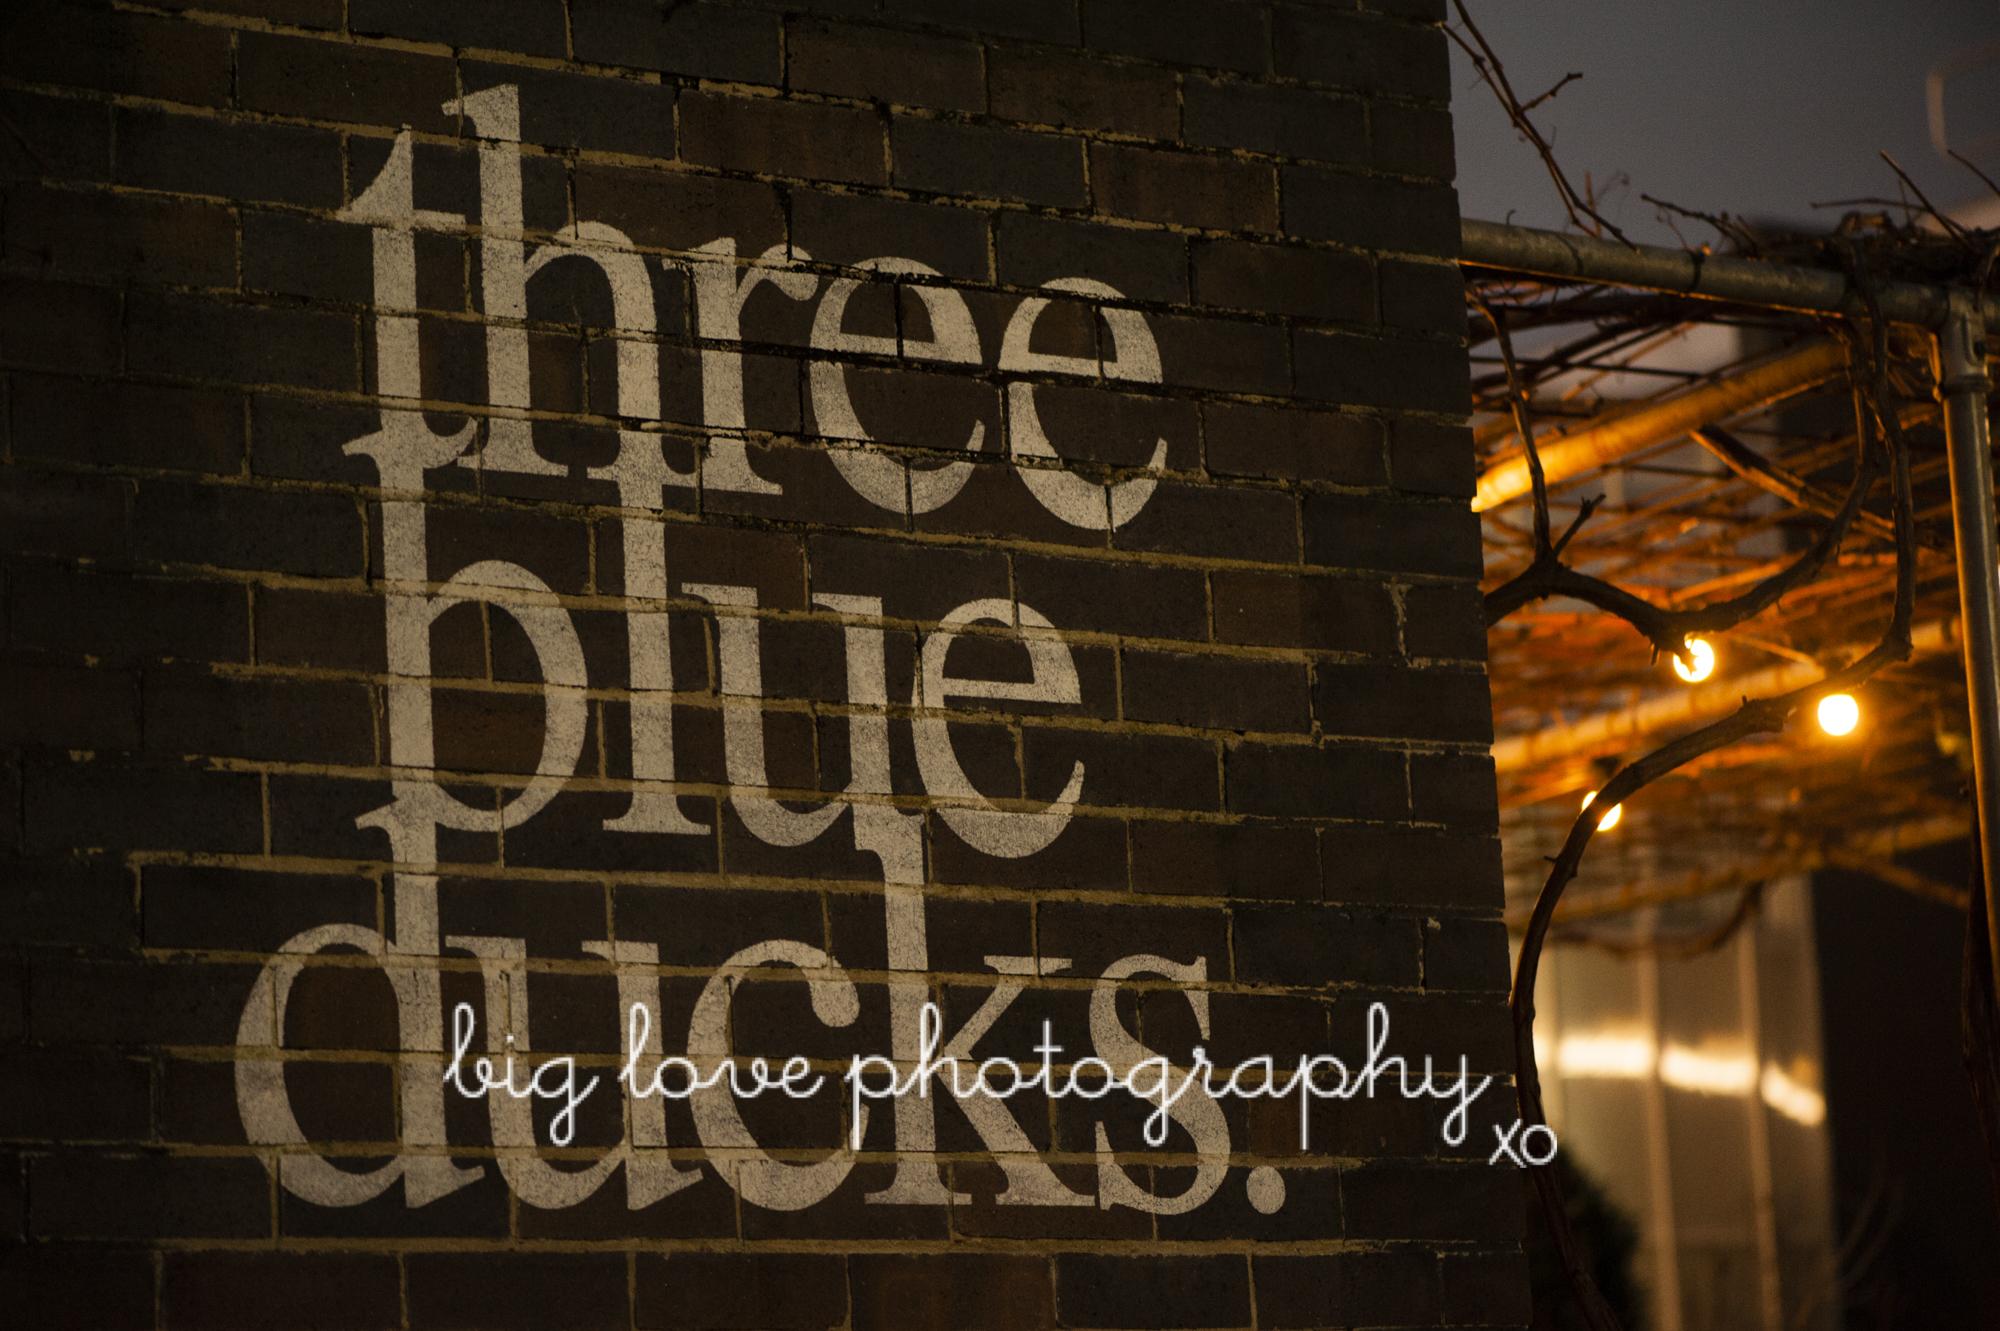 sydneyweddingphotography-4005.jpg